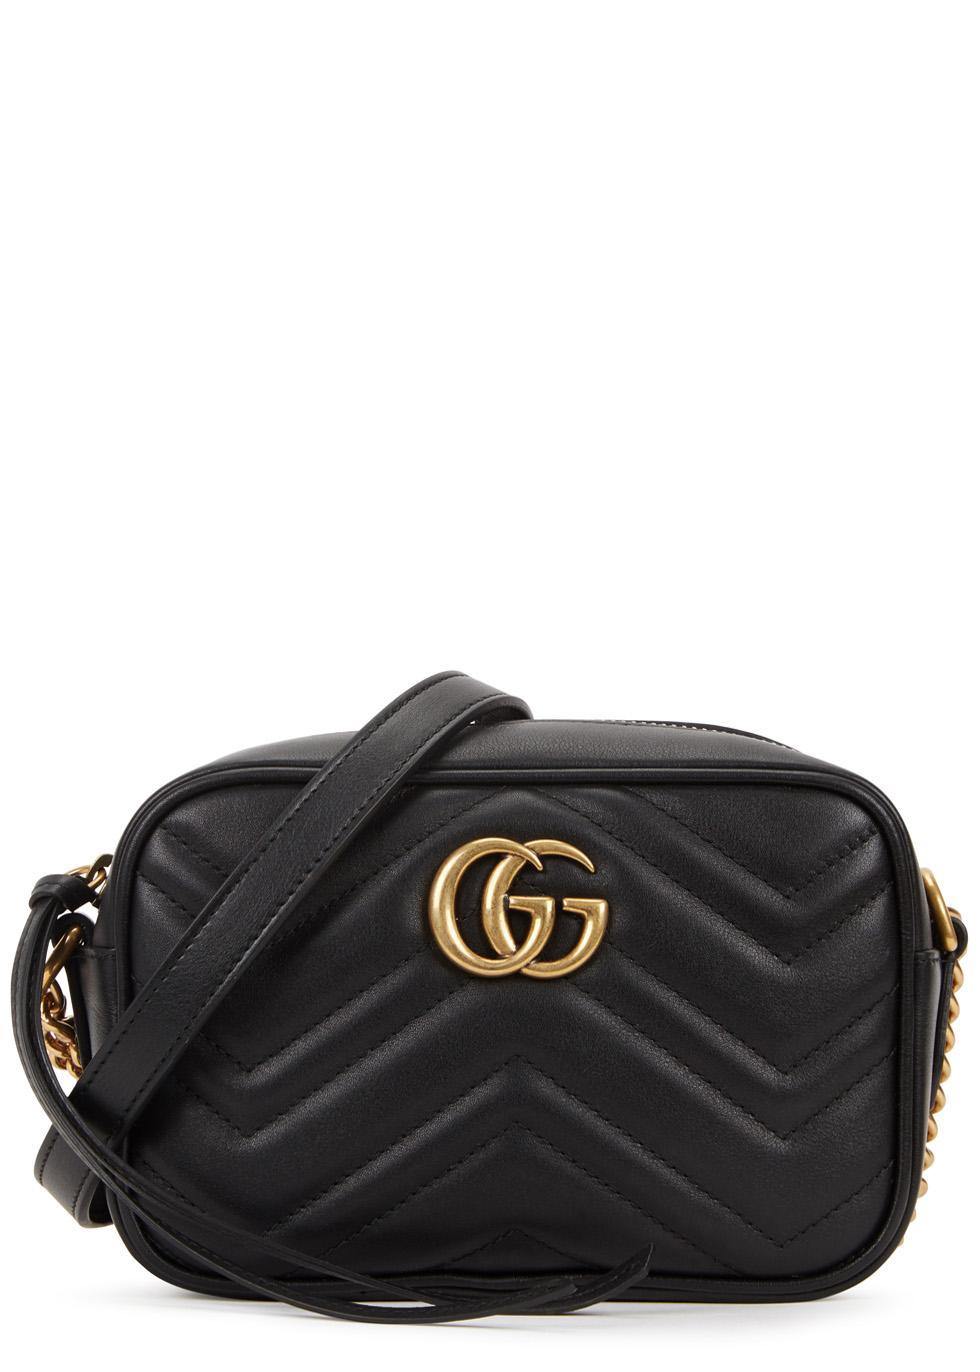 23ef1bfaada Gucci Marmont Mini Chain Bag Uk. Gucci Gg Marmont Matelassã© Mini Bag in  Black